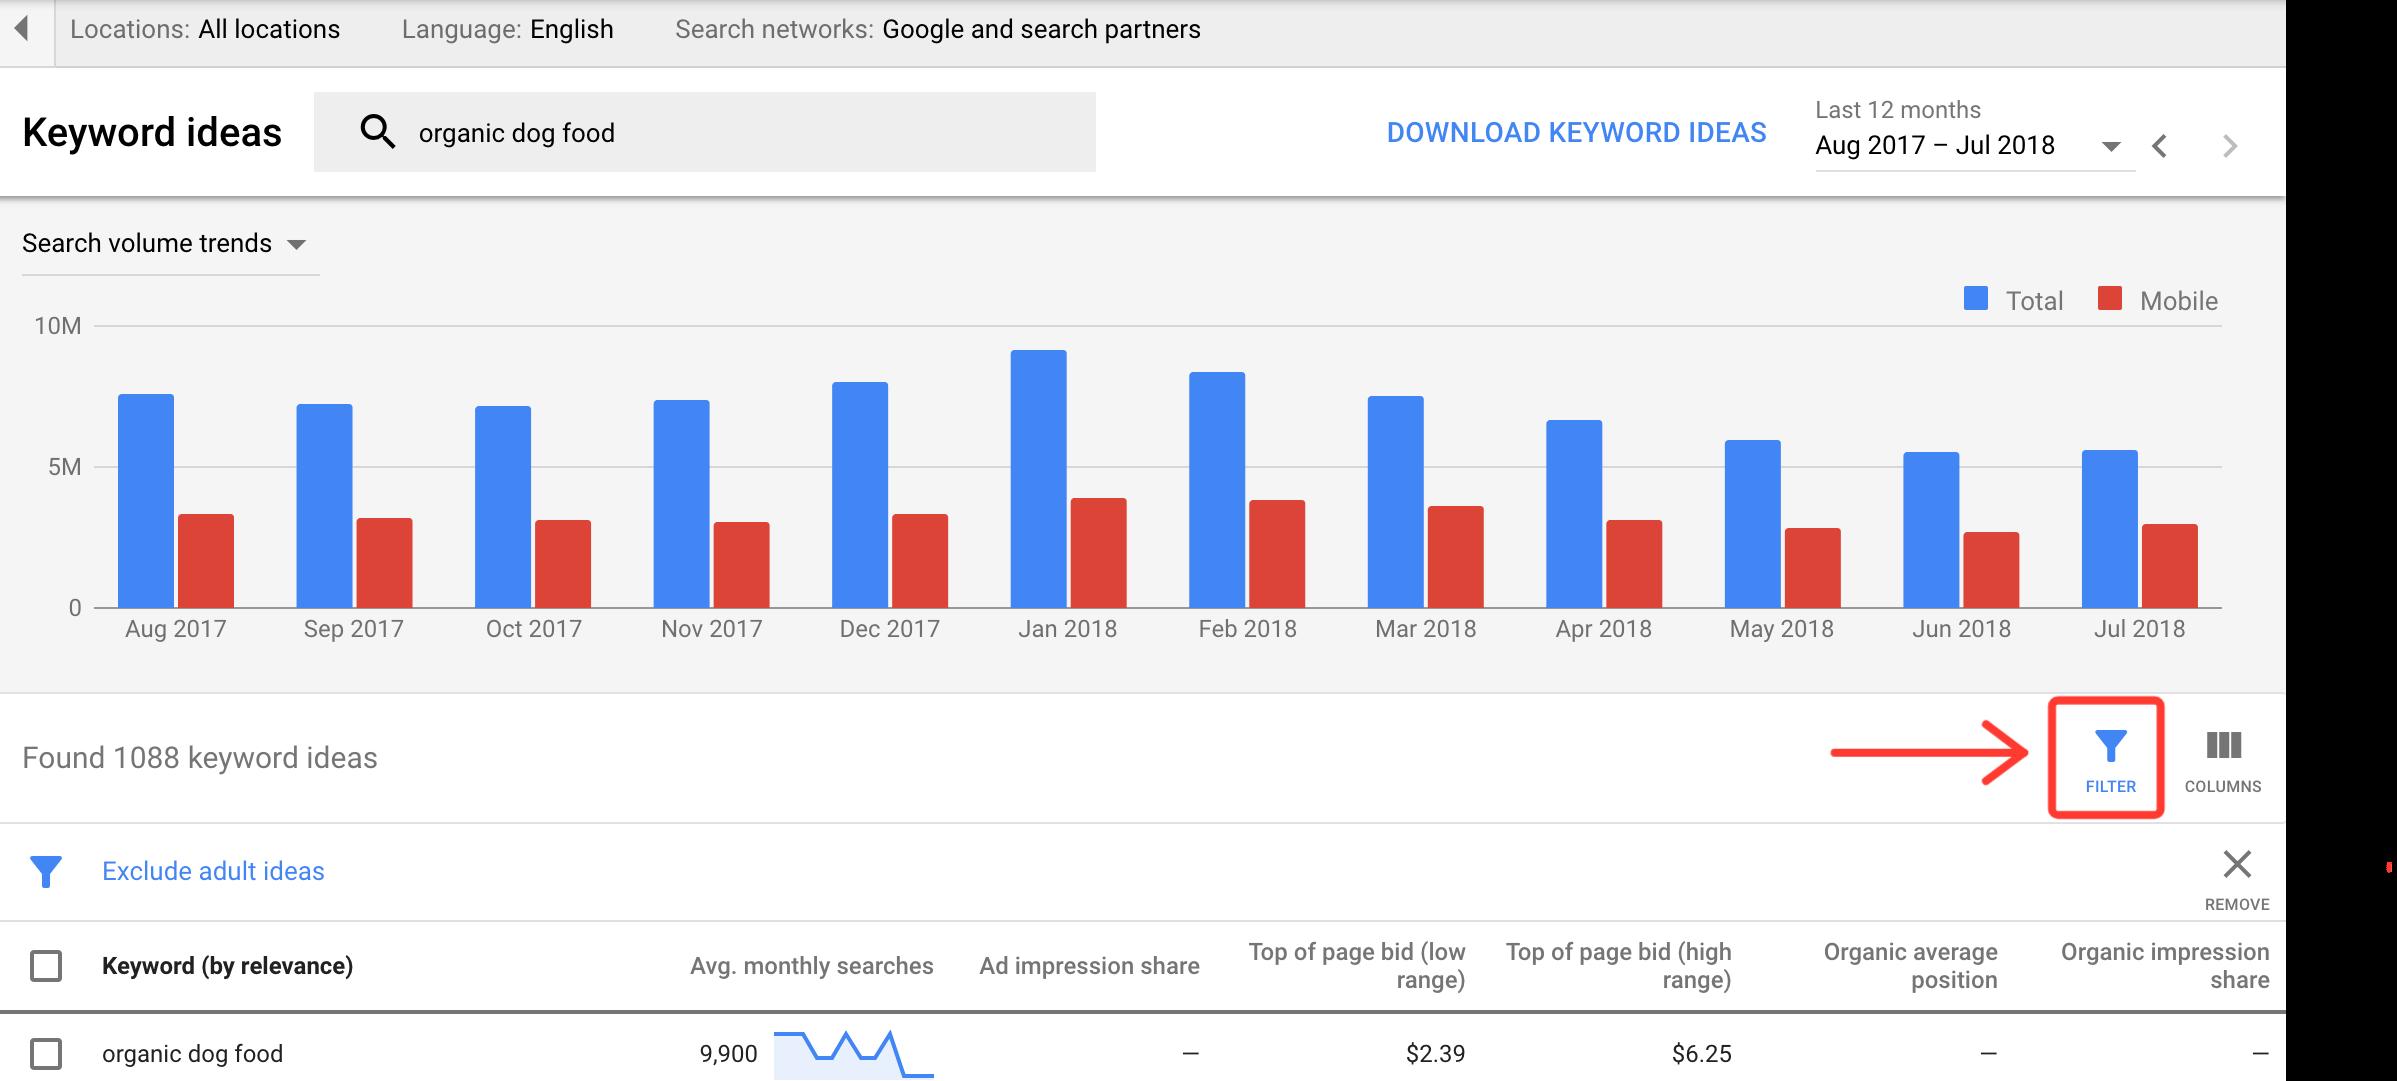 Google Keyword Planner filters